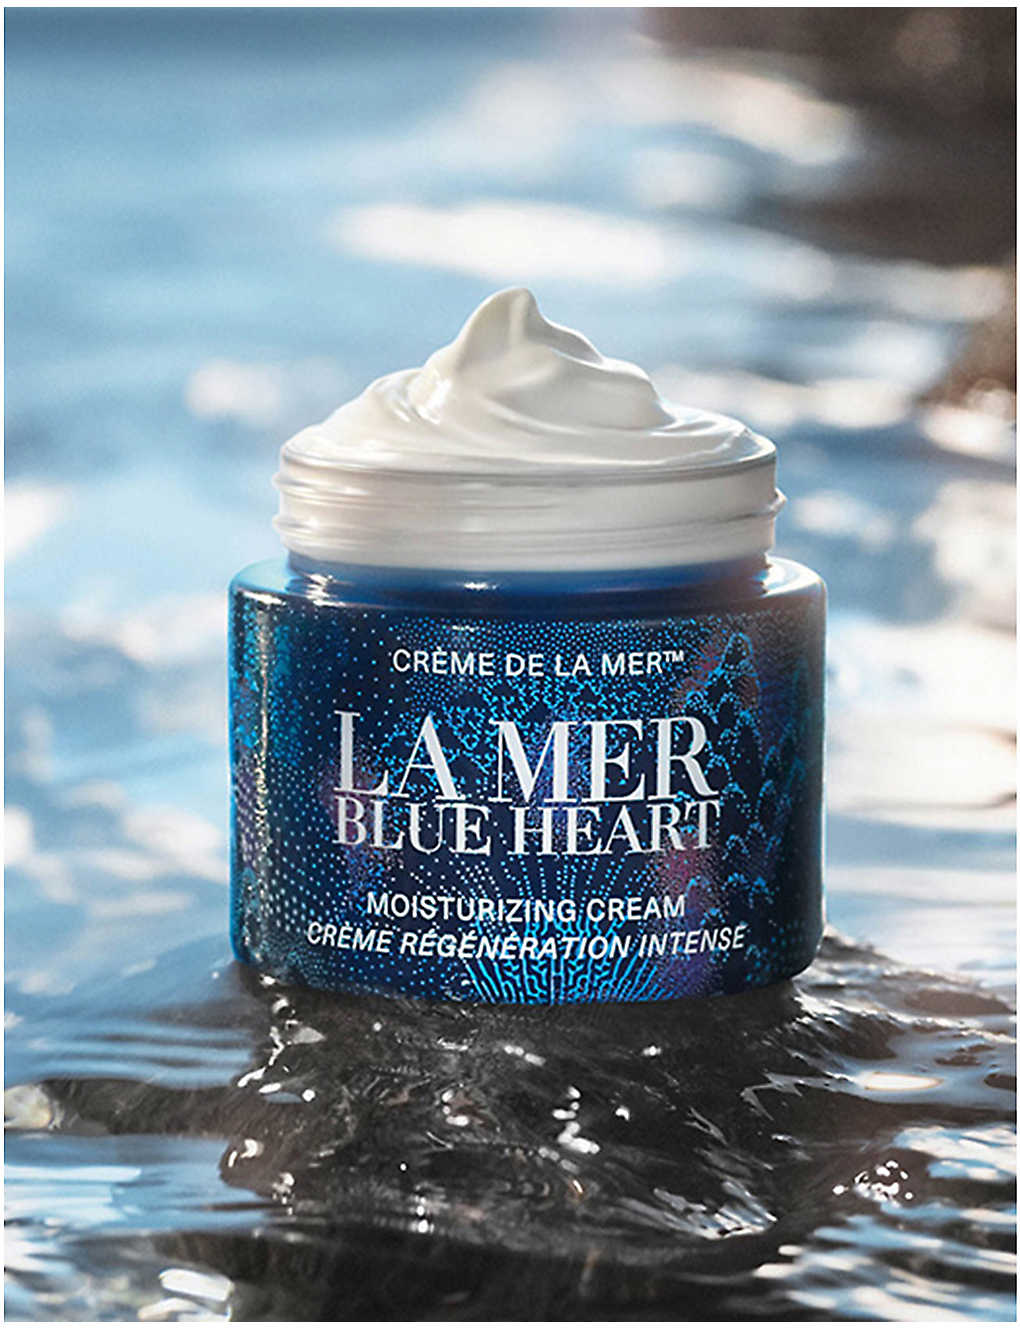 La Mer Blue Heart Creme De La Mer Moisturizing Cream 2021